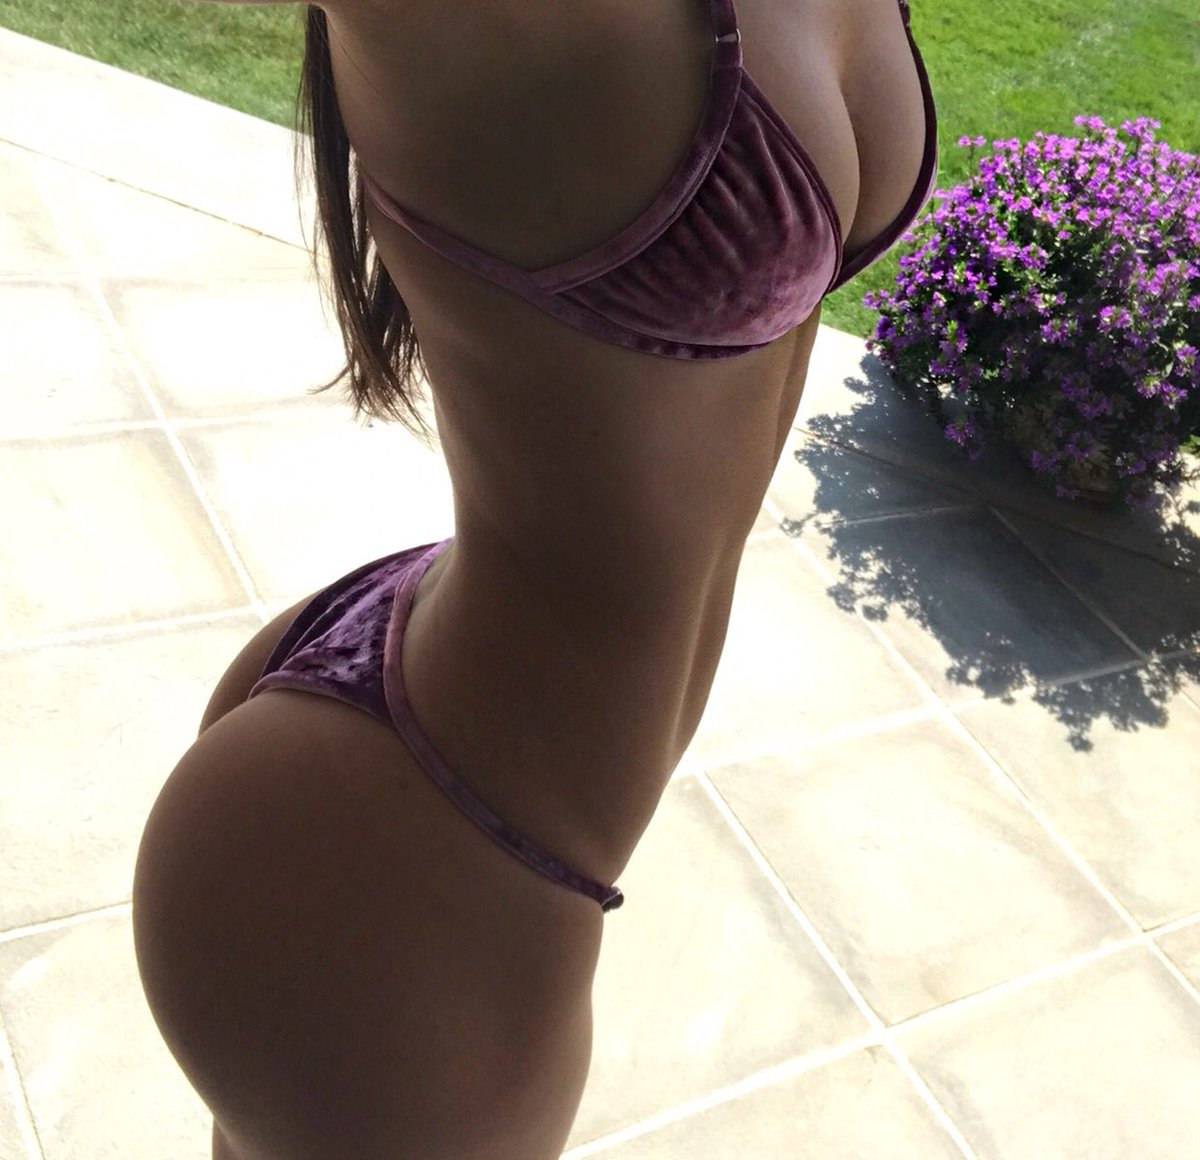 Jen Selter